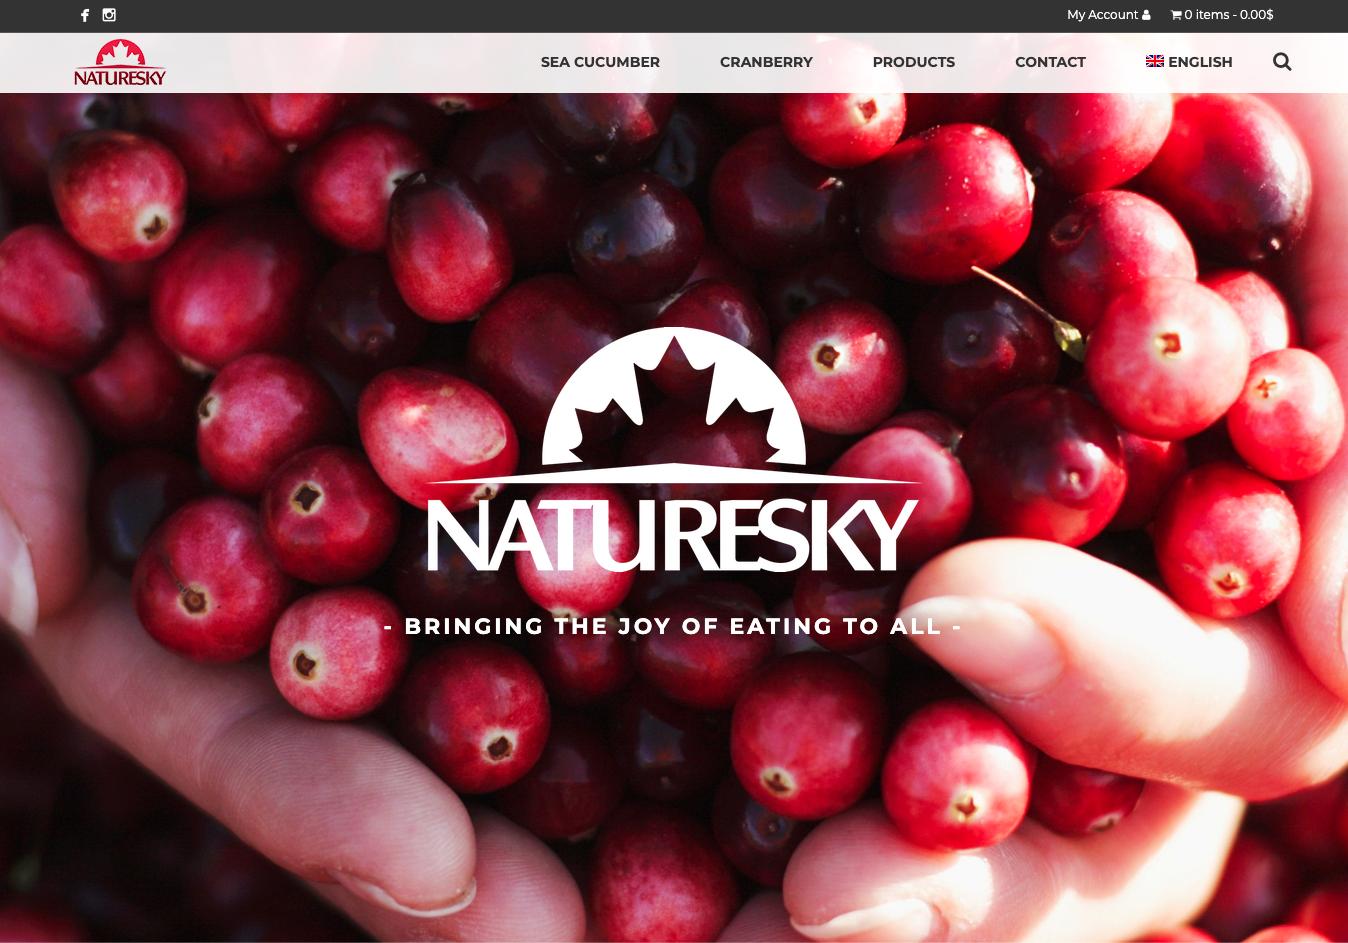 NatureSky